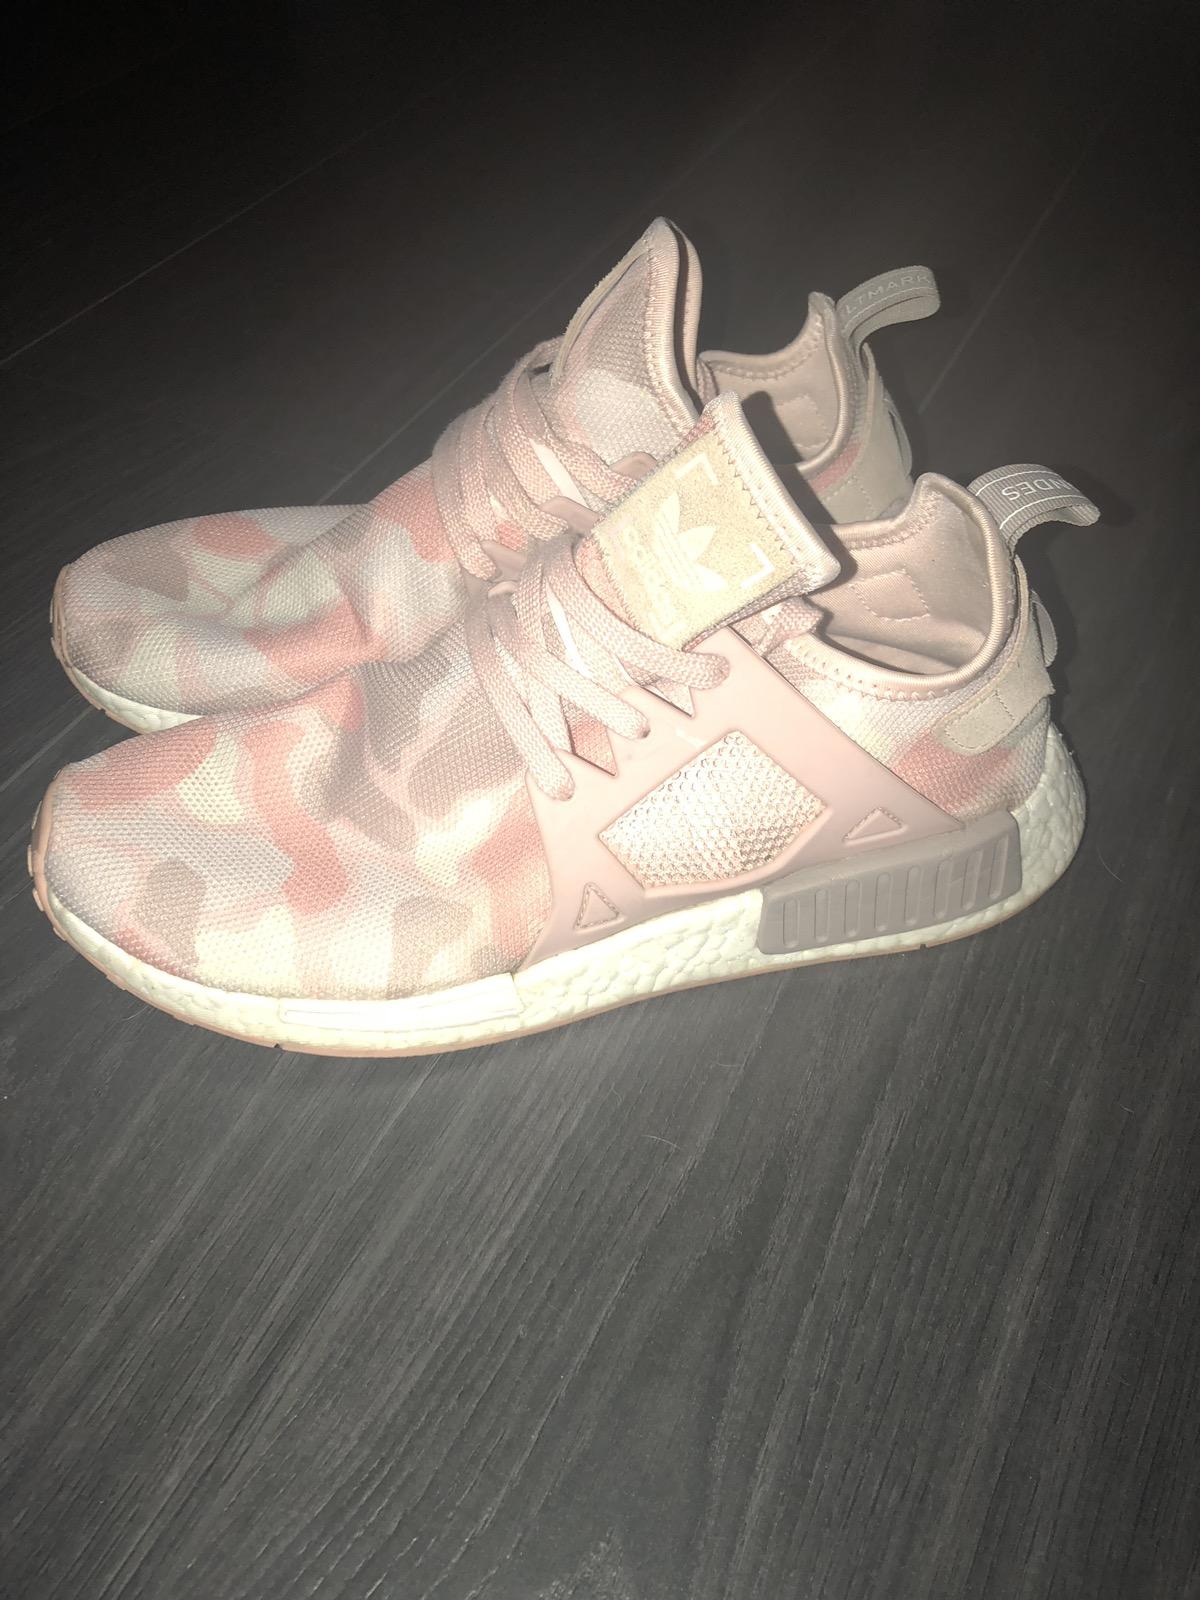 "Adidas Nmd XR1 ""Pink Duck Camo"""